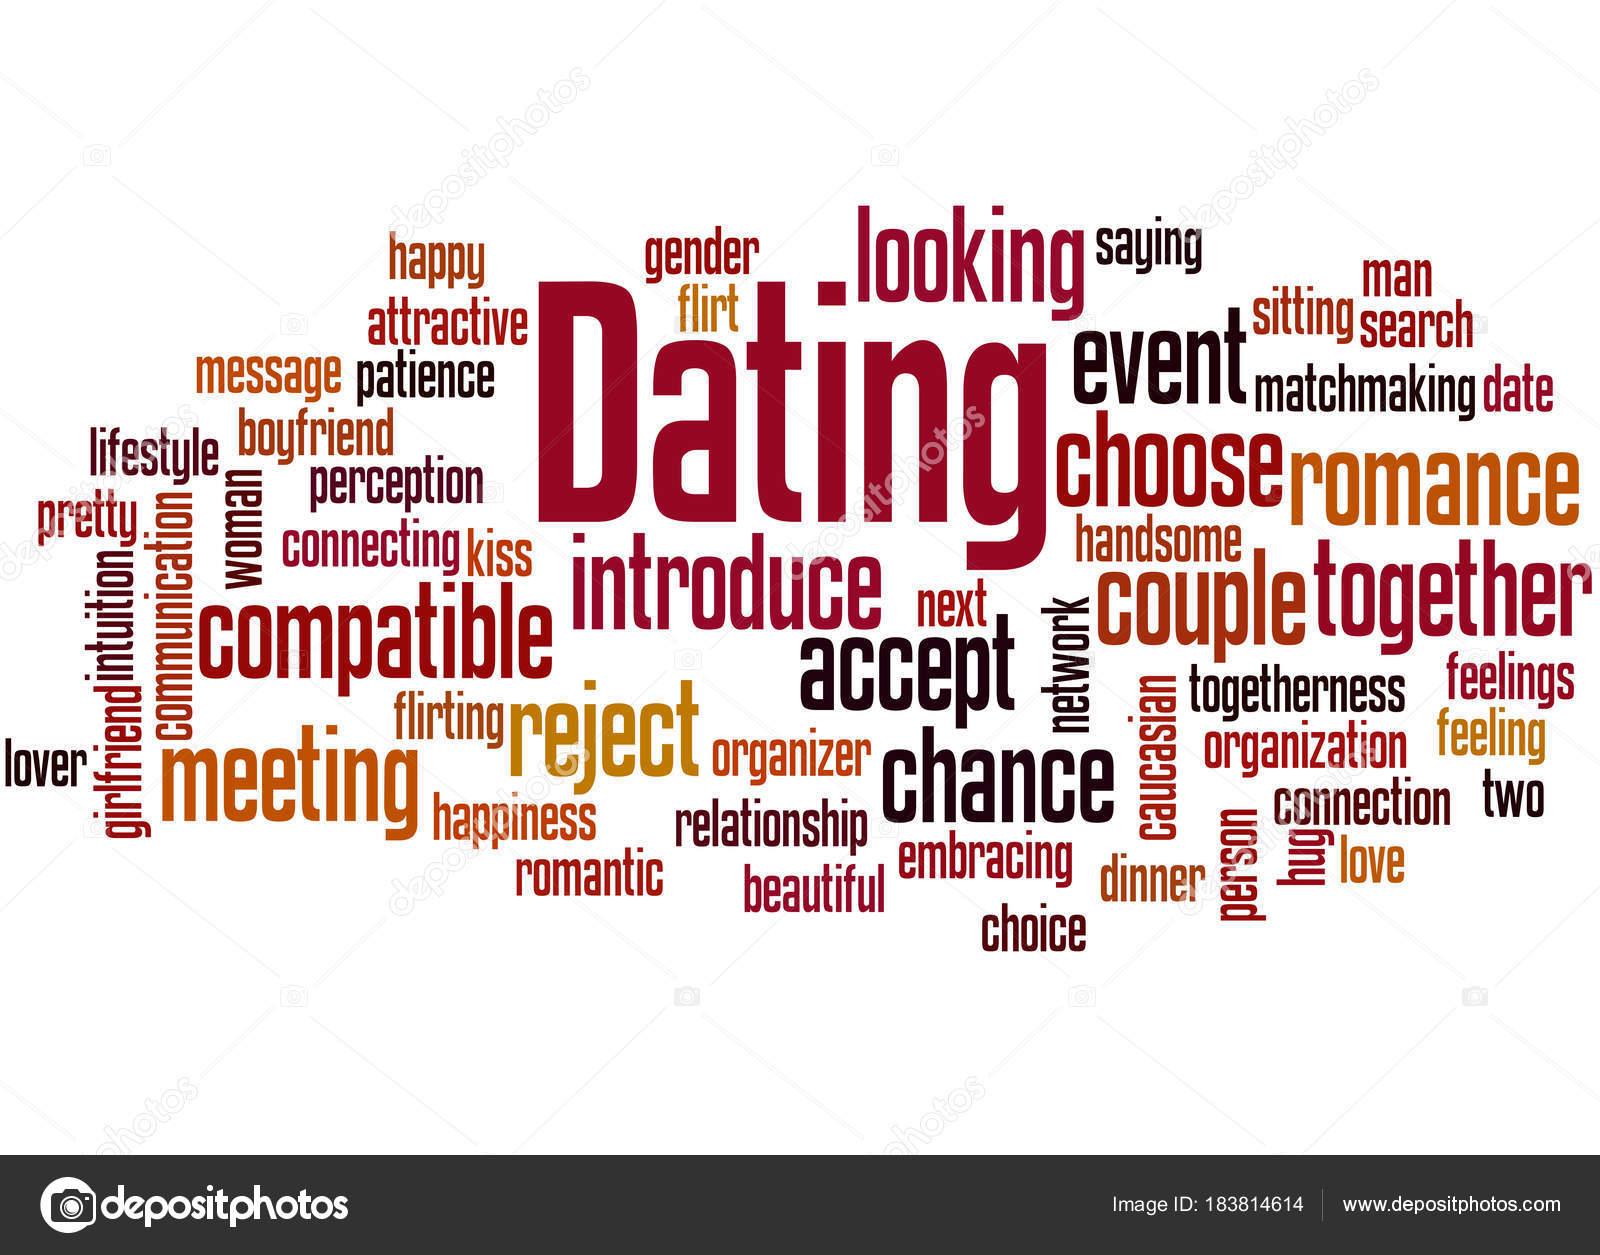 Bodybuilding ιστοσελίδες dating UK